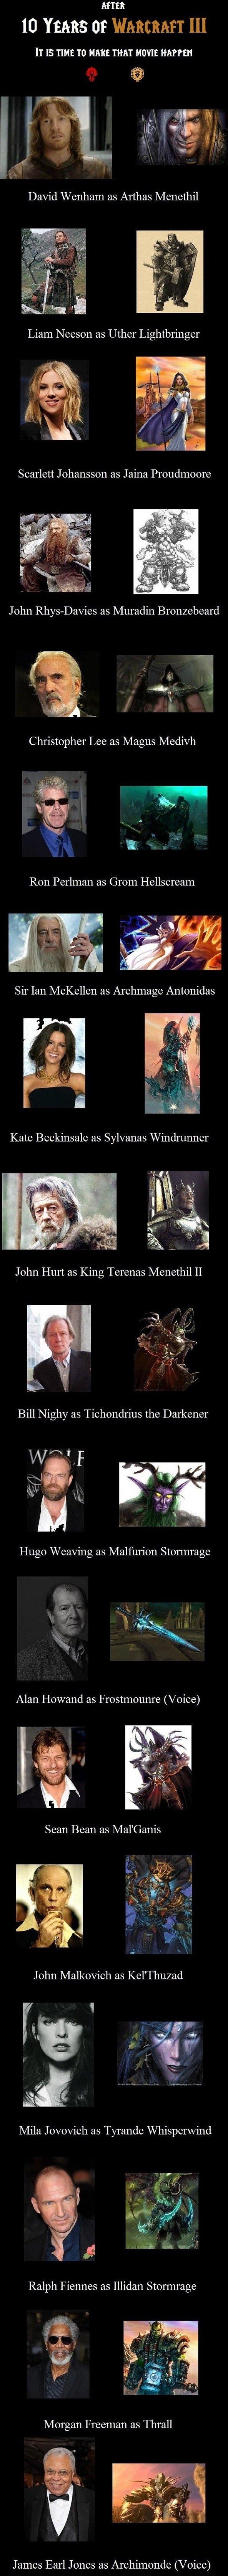 FUCKING DO IT FAGGOT. . AFTER 10 YEARS of It IS TIME TO MARIE mm Mom karma David Wenham as Arthas Menethil John Malkovich as Kel' Thuzad tlt Mila J as Tyrande W